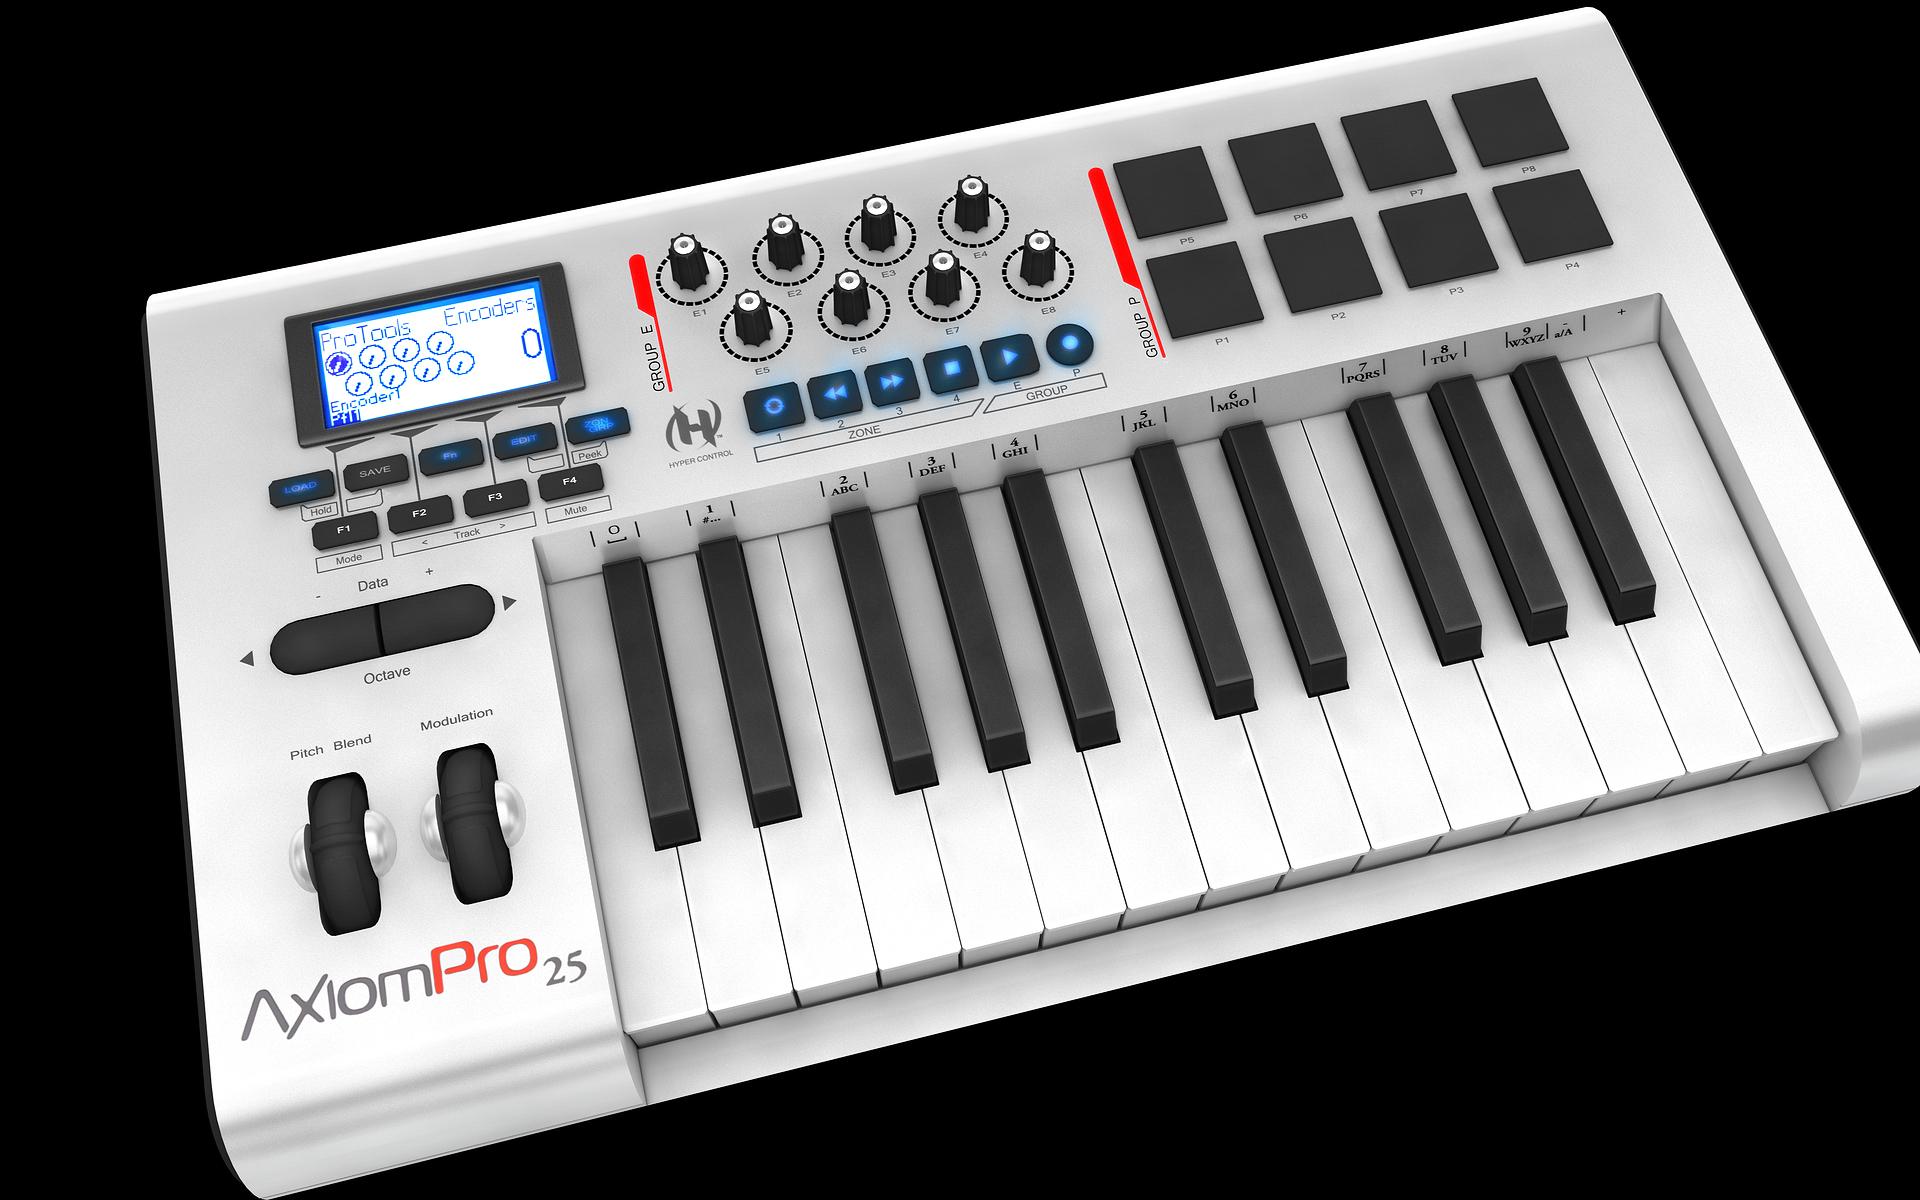 m audio axiom pro 25 image 366317 audiofanzine rh en audiofanzine com M-Audio Axiom 25 Keyboard M-Audio Keystation 61